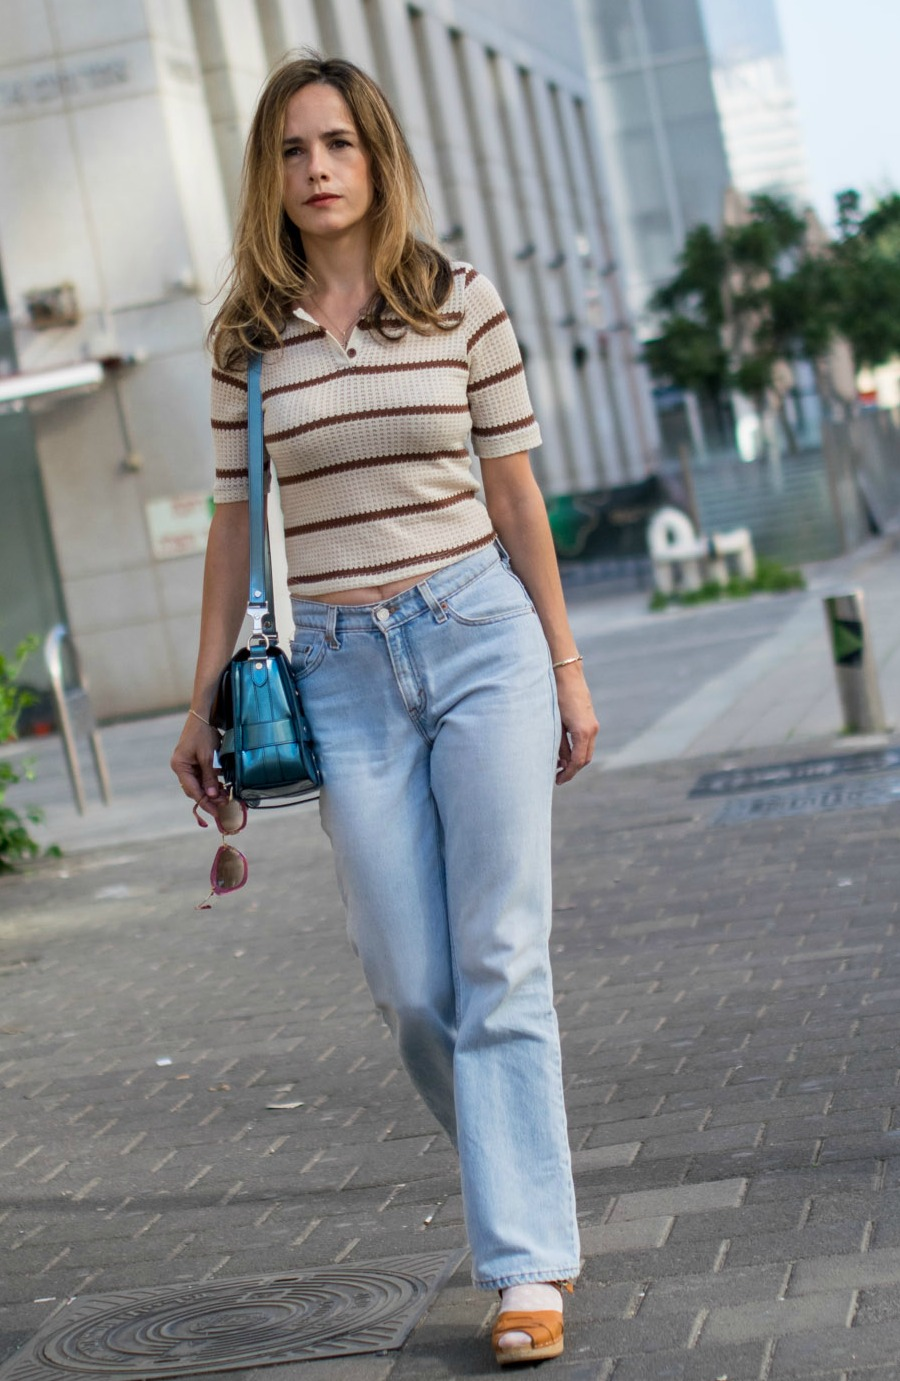 polotshirtwomen, Tshirt, streetstyle, ootd, ss16, Ps11, fashionblog, wear, thepisceswoman, אופנה, בלוגאופנה